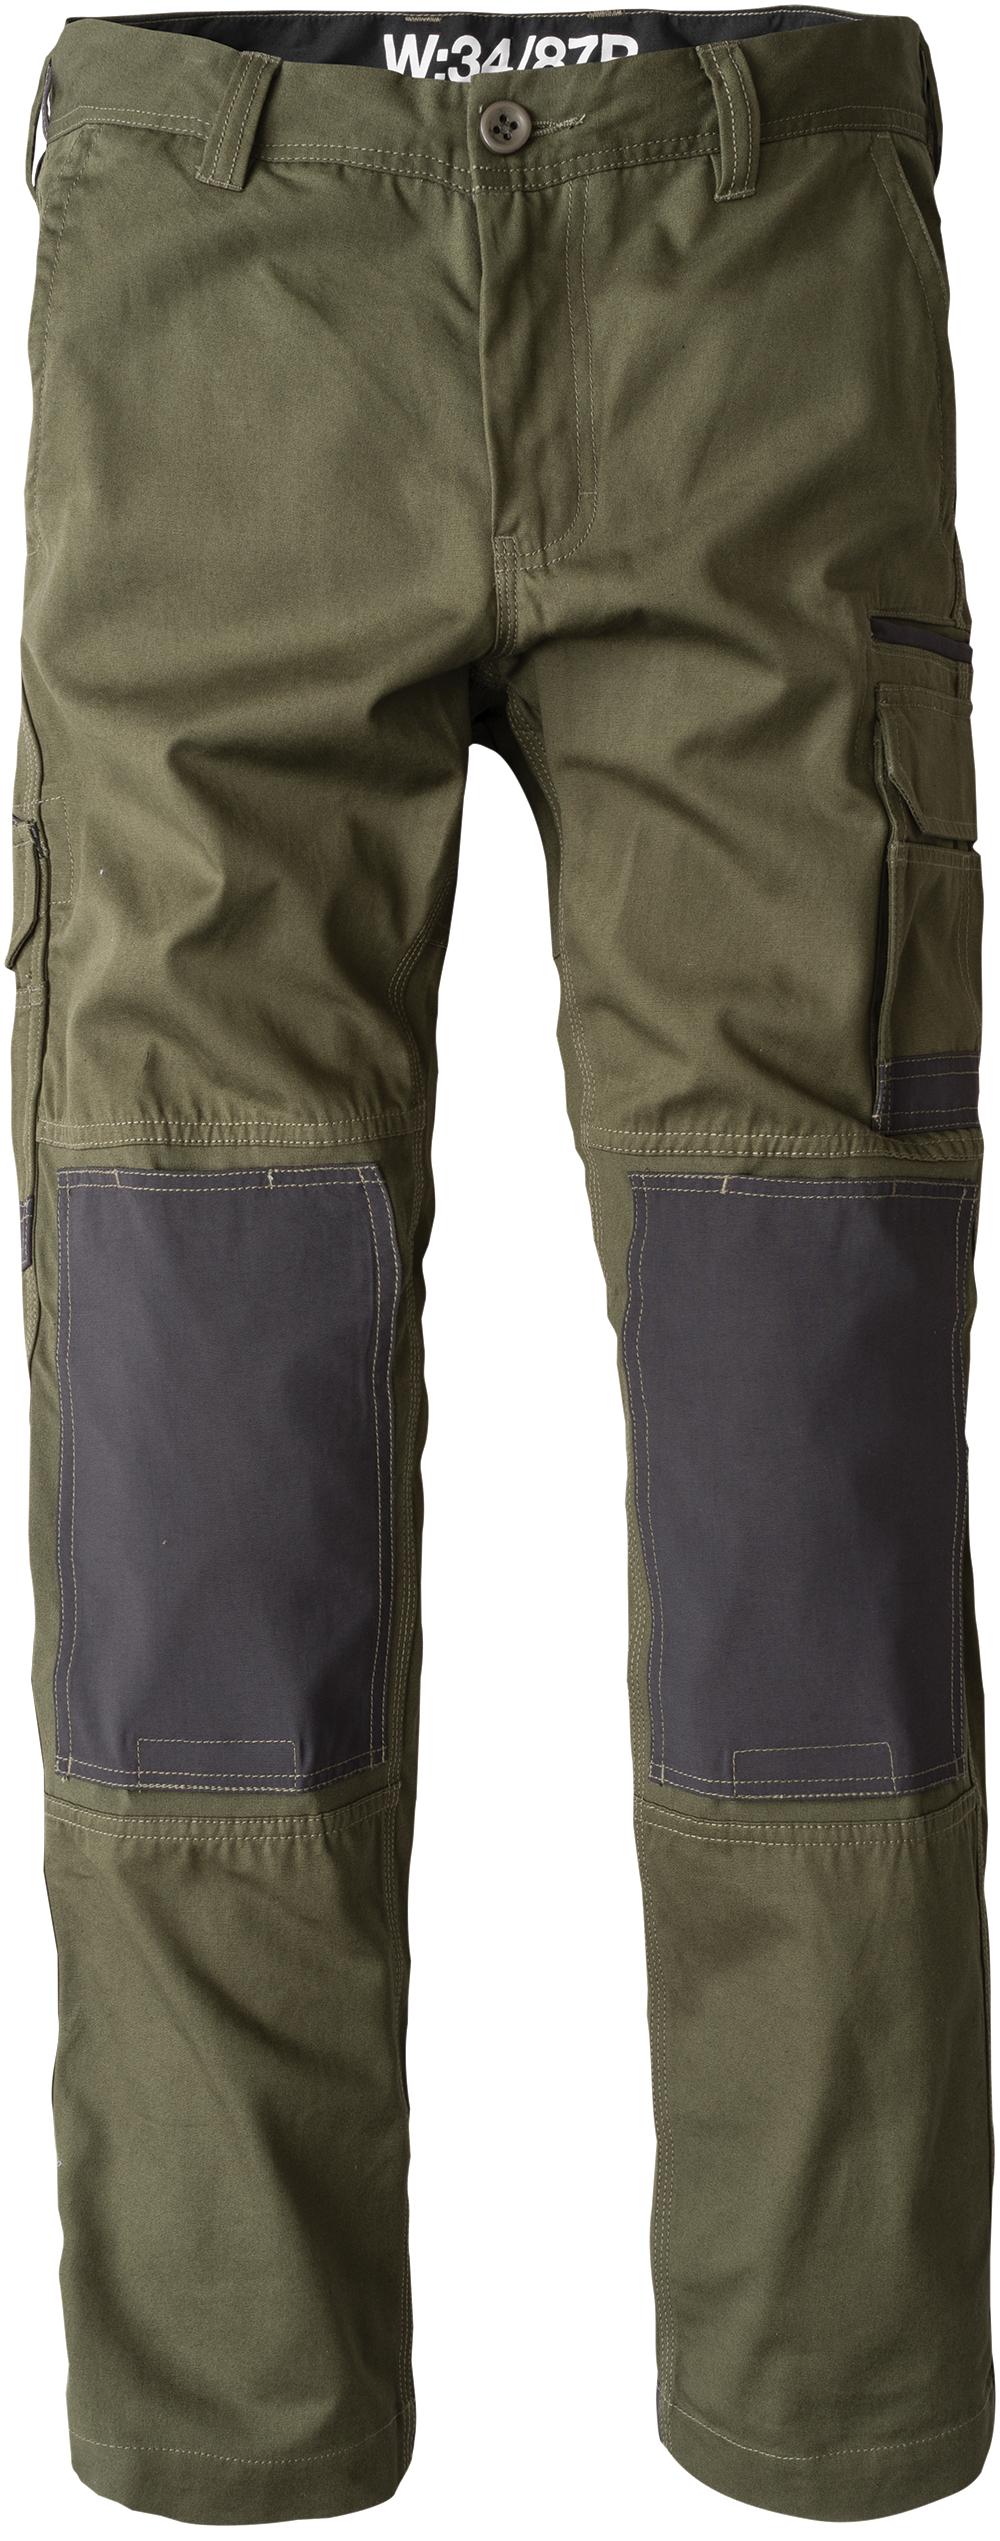 fxd wp-1 work trousers jmegwbn